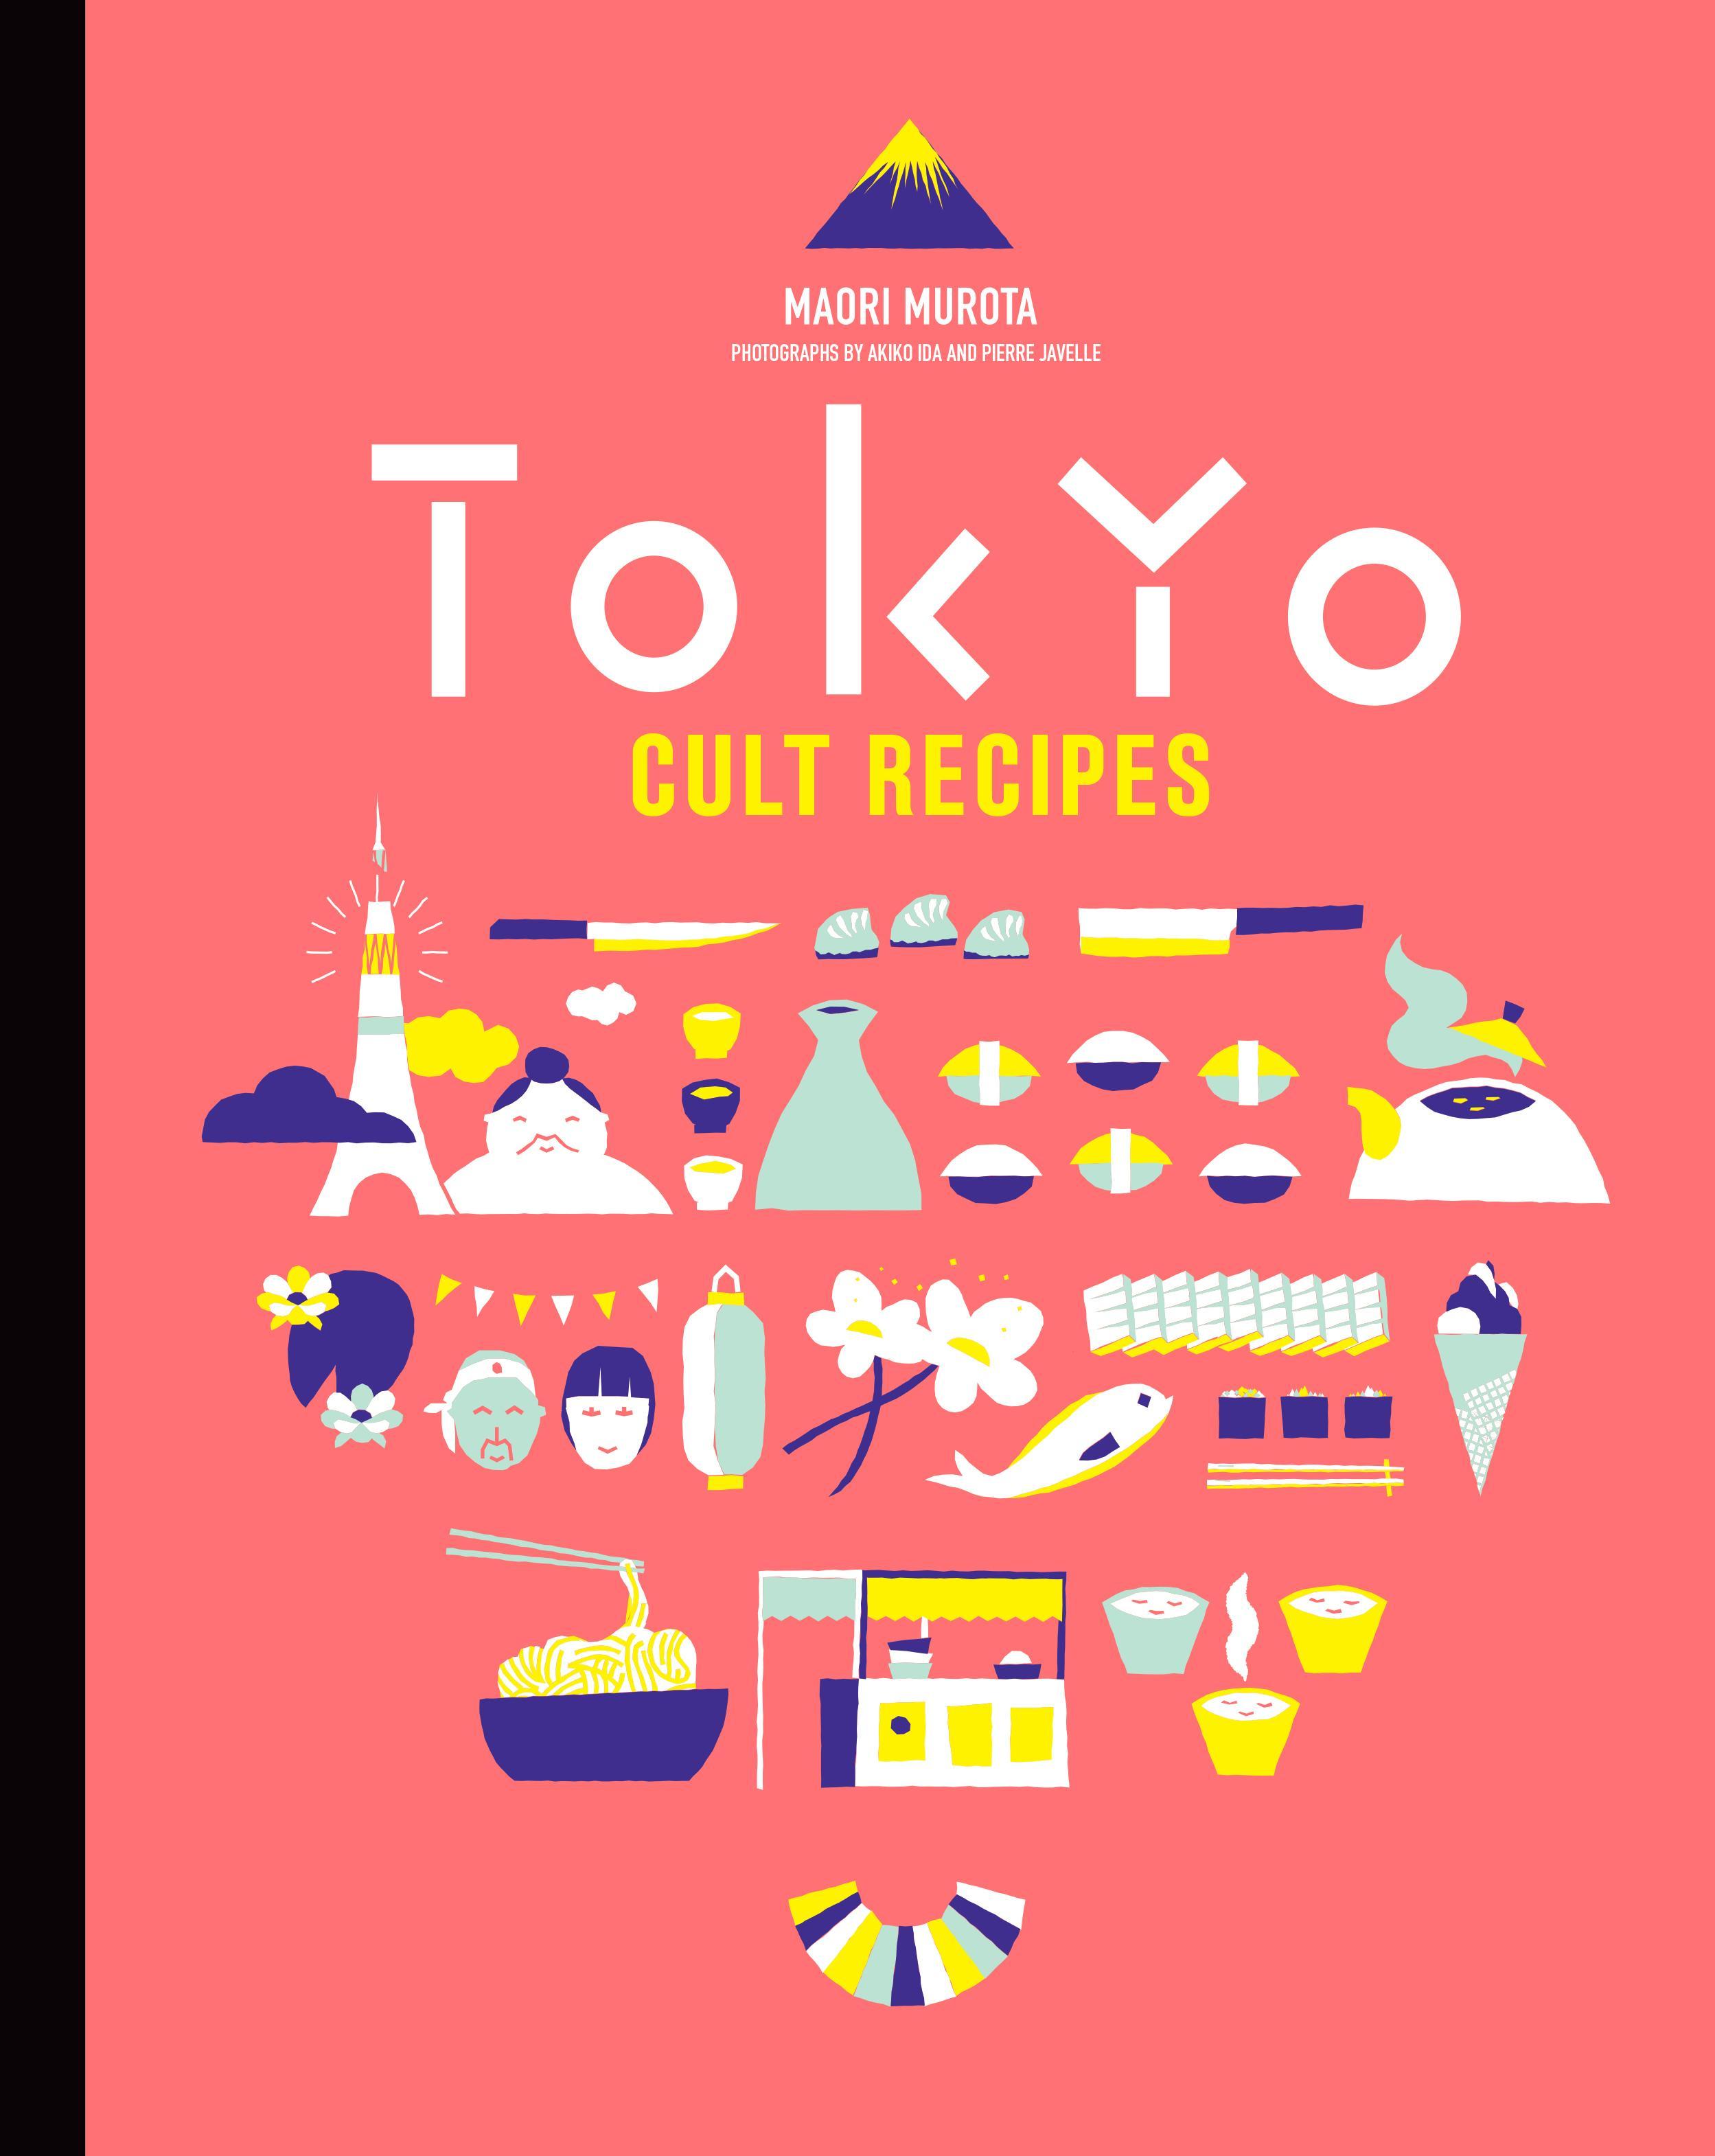 TokyoCultRecipes